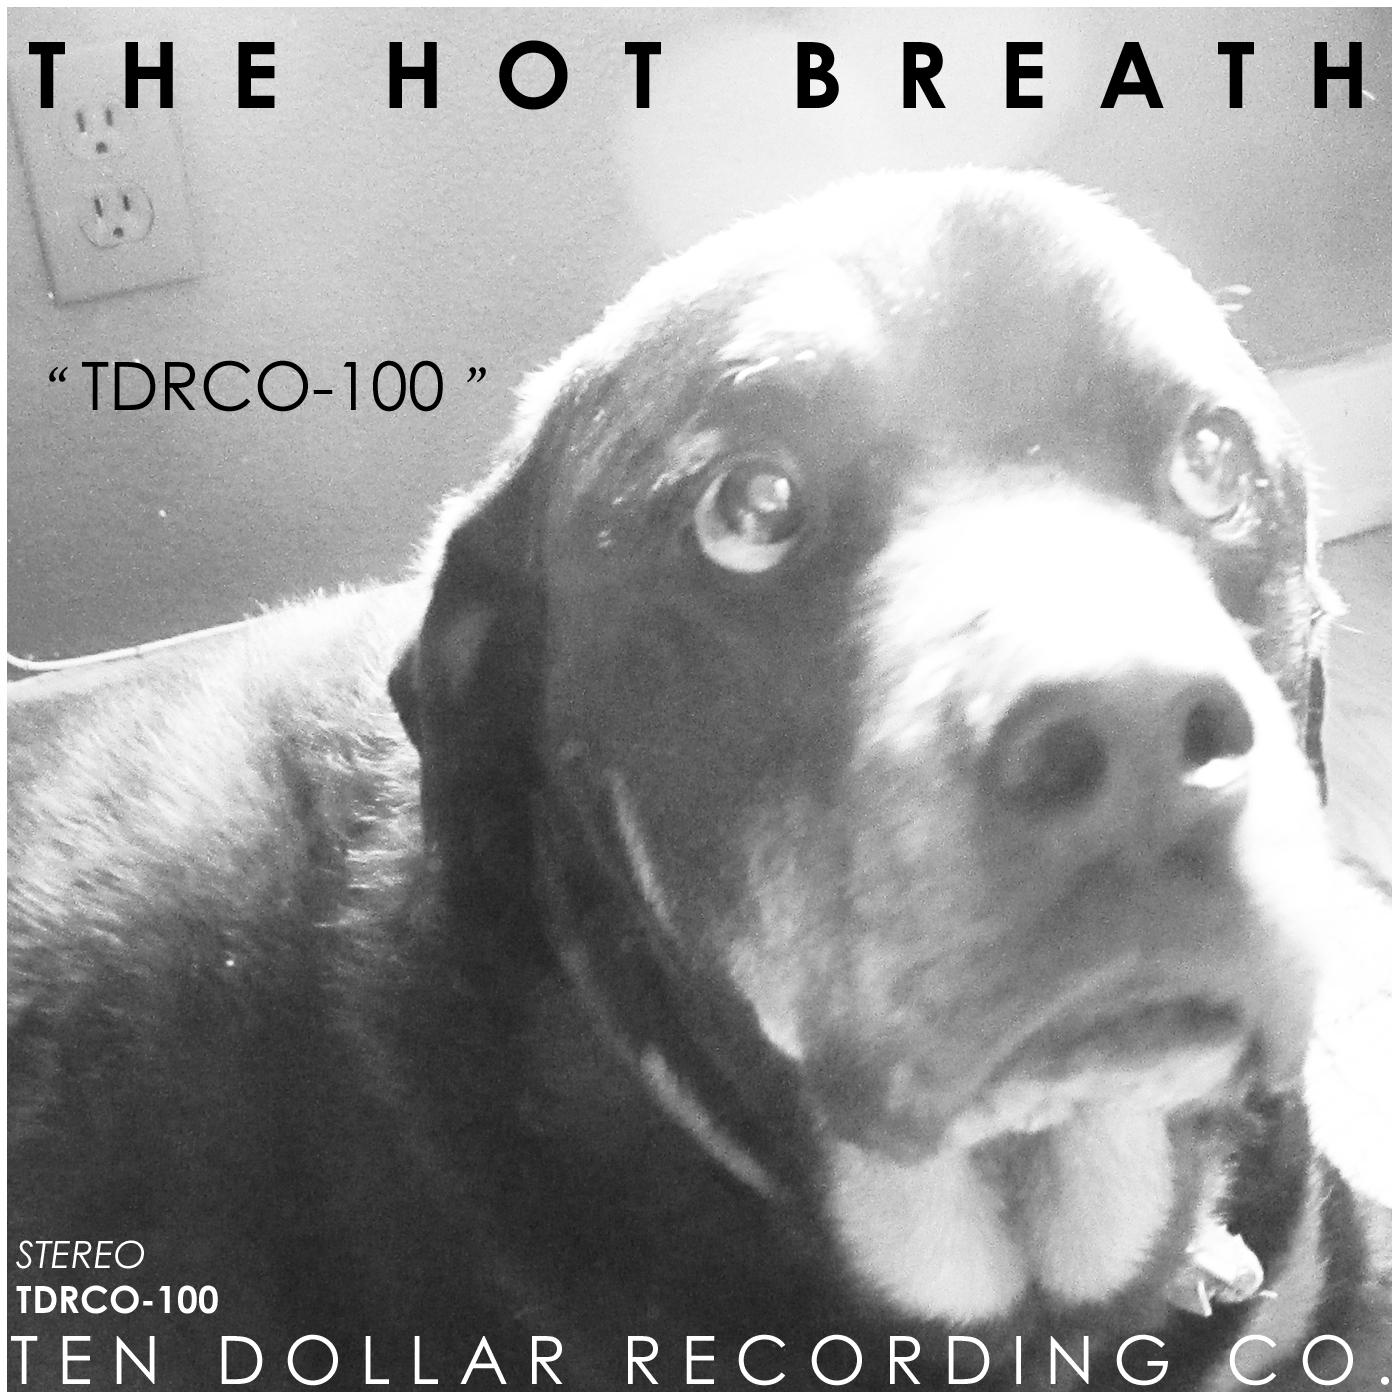 The Hot Breath - TDRCO-100 (Single)